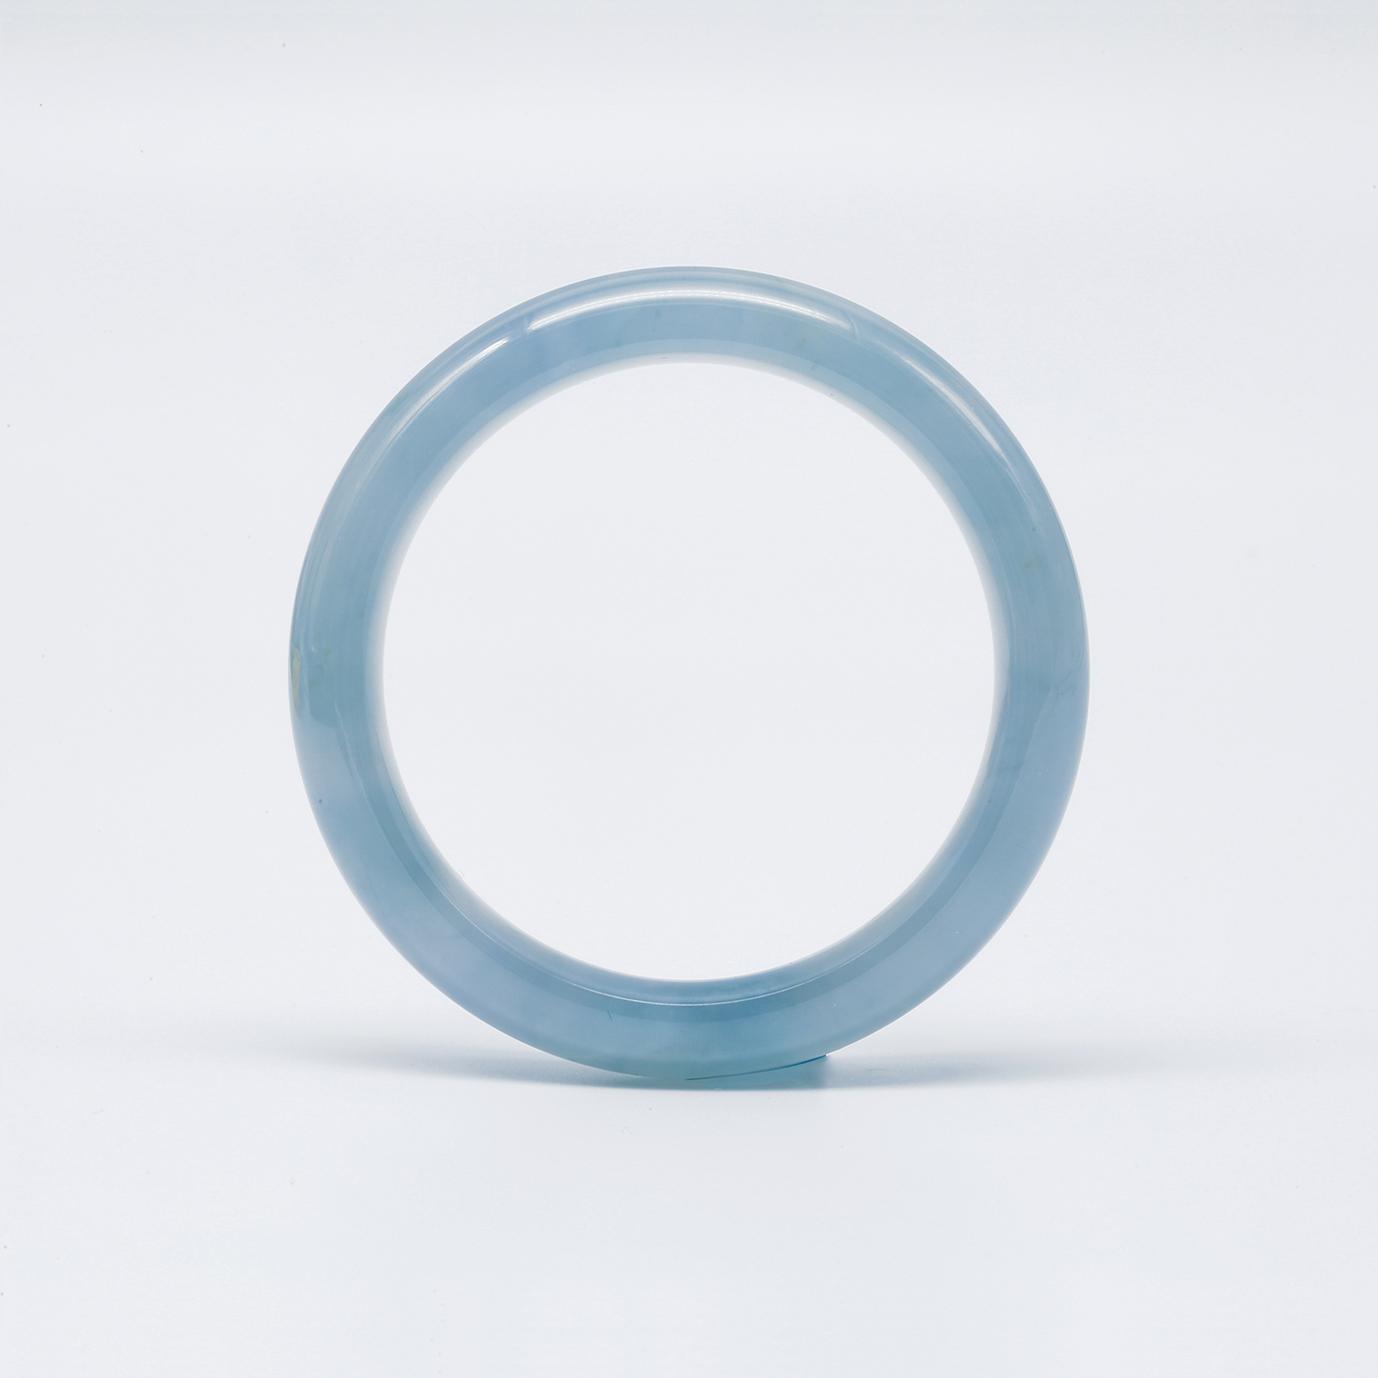 Clear Translucent Jadeite Jade Bangle